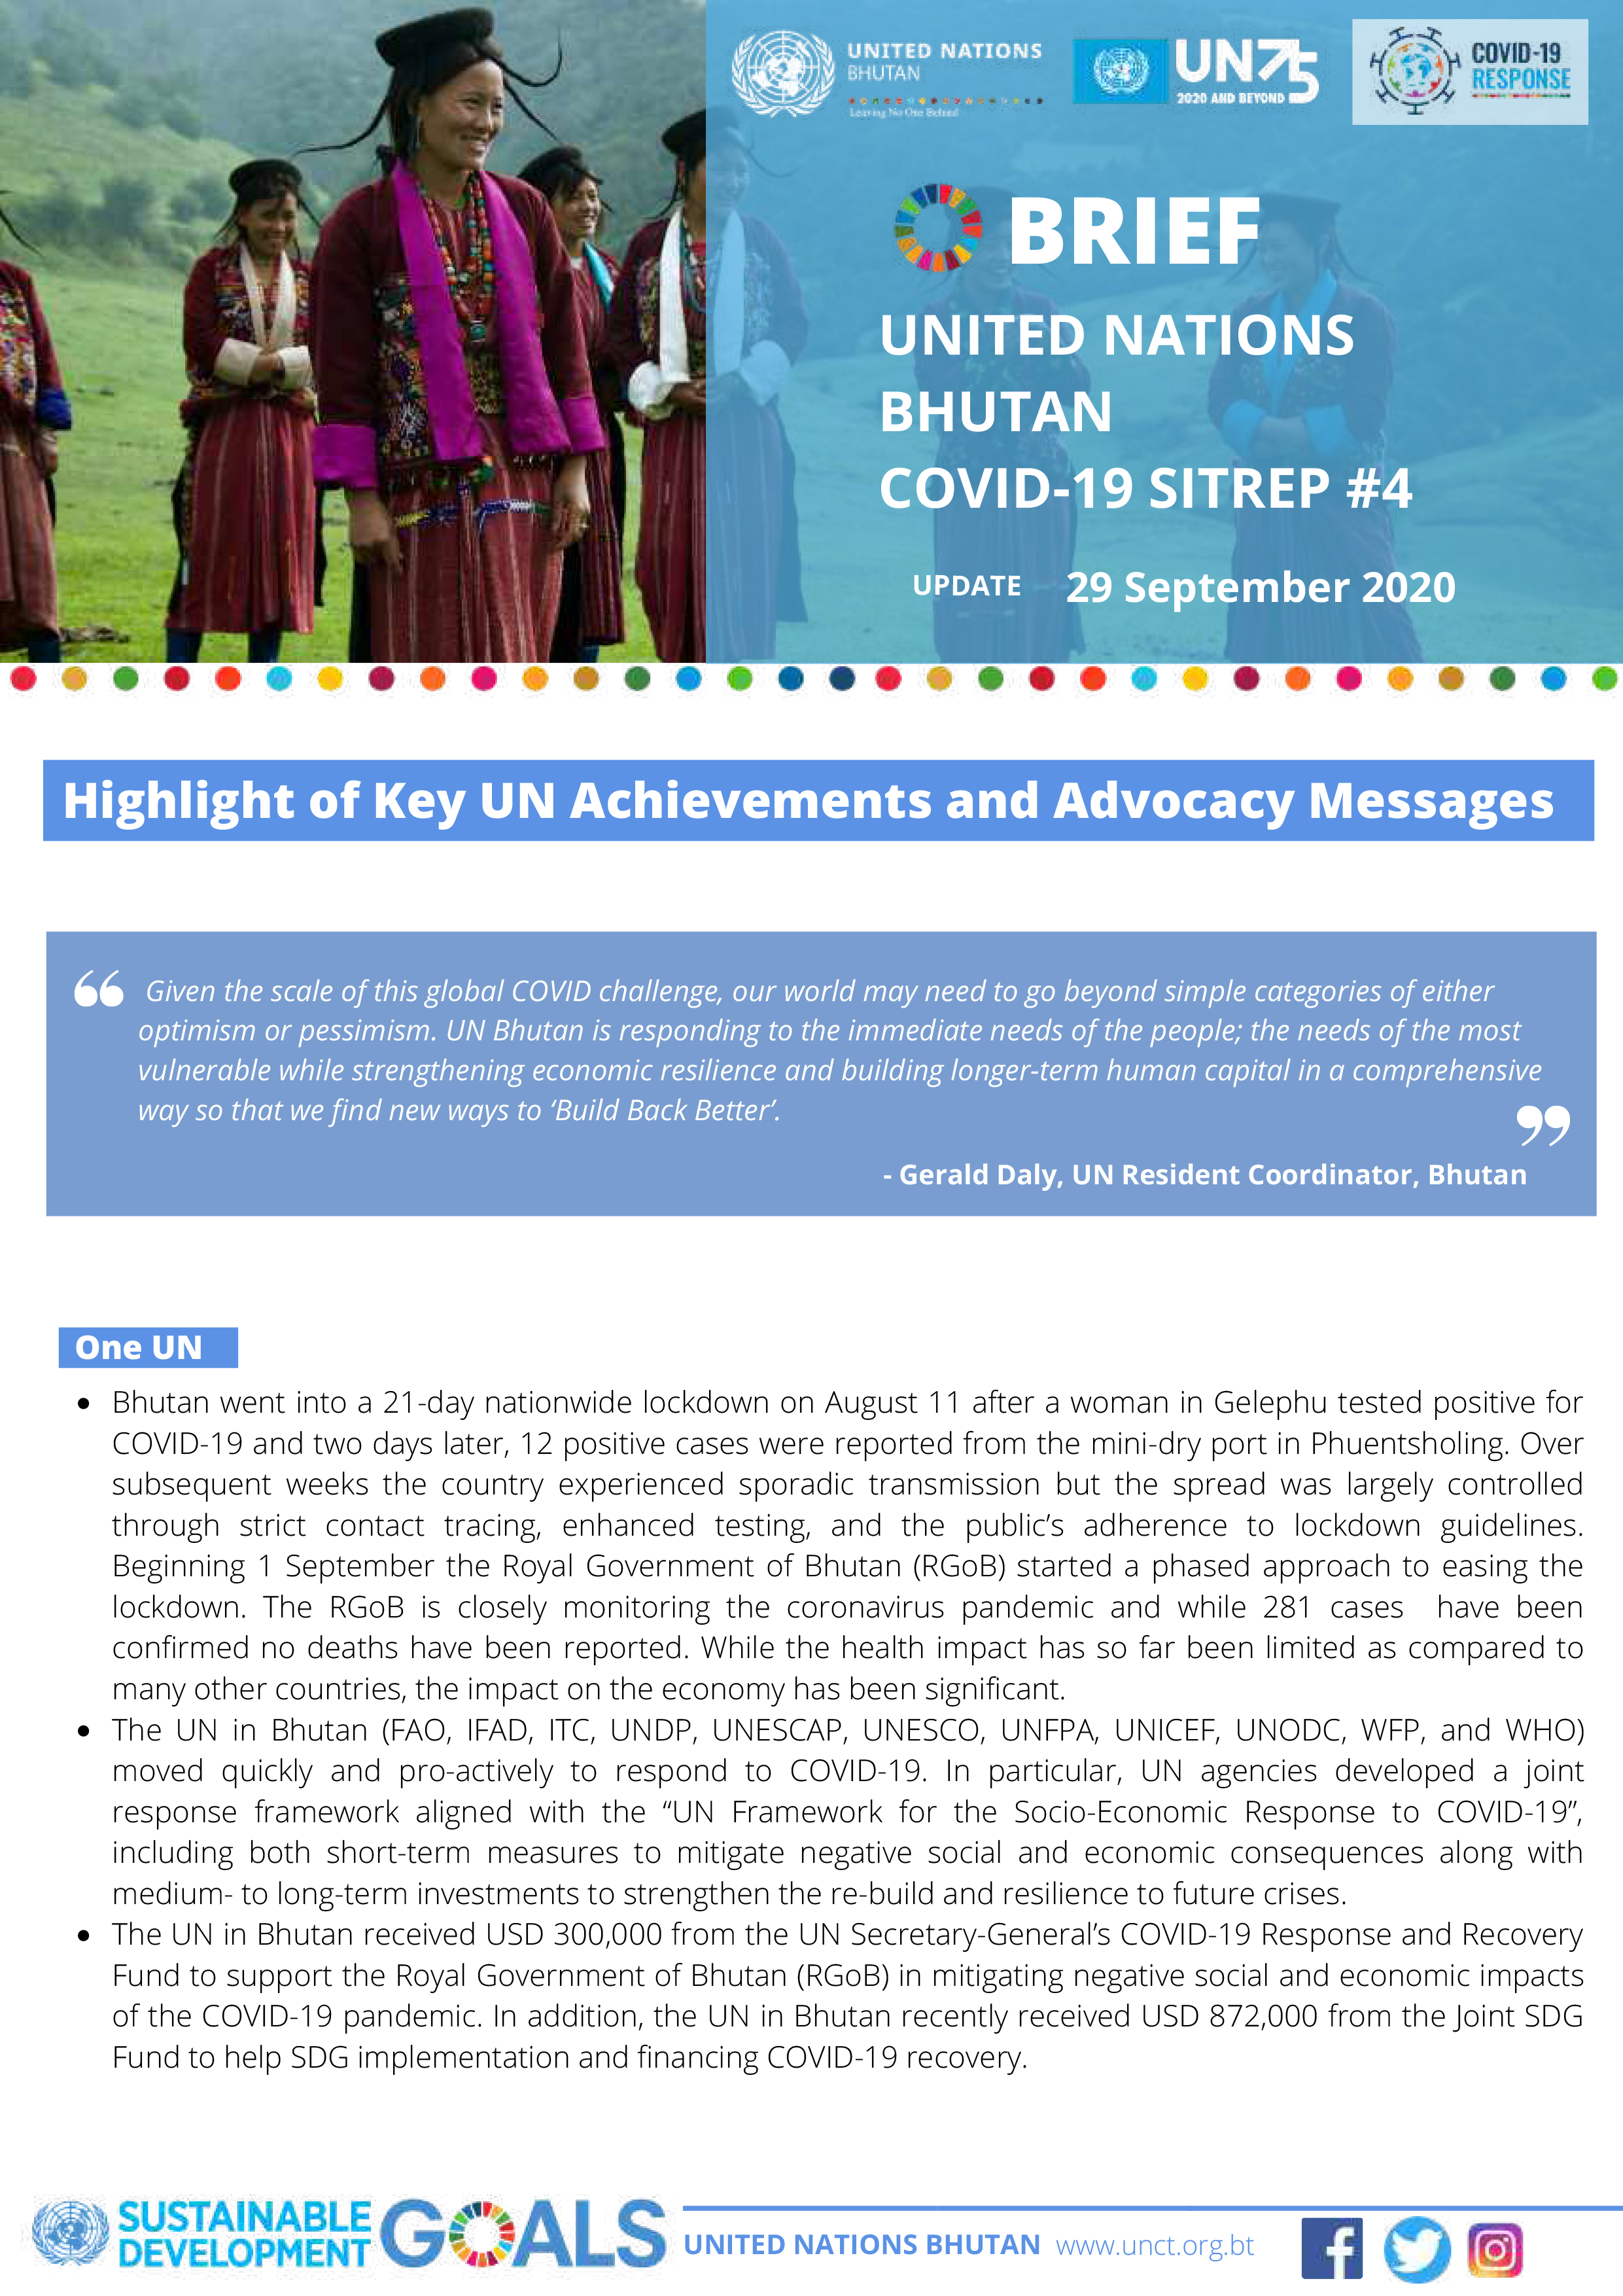 UN Bhutan COVID-19 Sitrep #4 – September